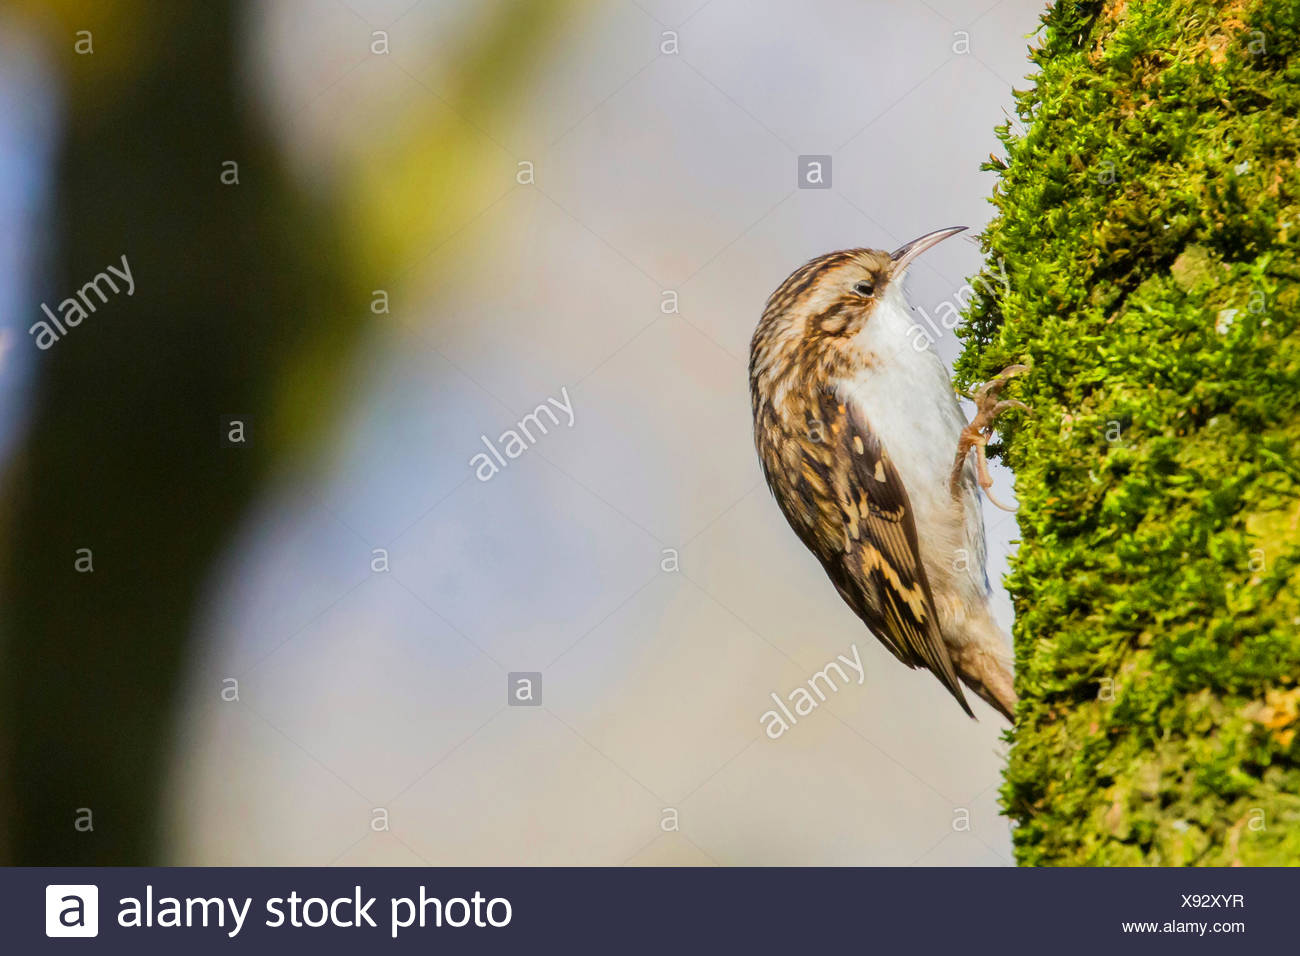 short-toed treecreeper (Certhia brachydactyla), inspecting mossy bark, Germany, Bavaria, Niederbayern, Lower Bavaria, Straubing - Stock Image